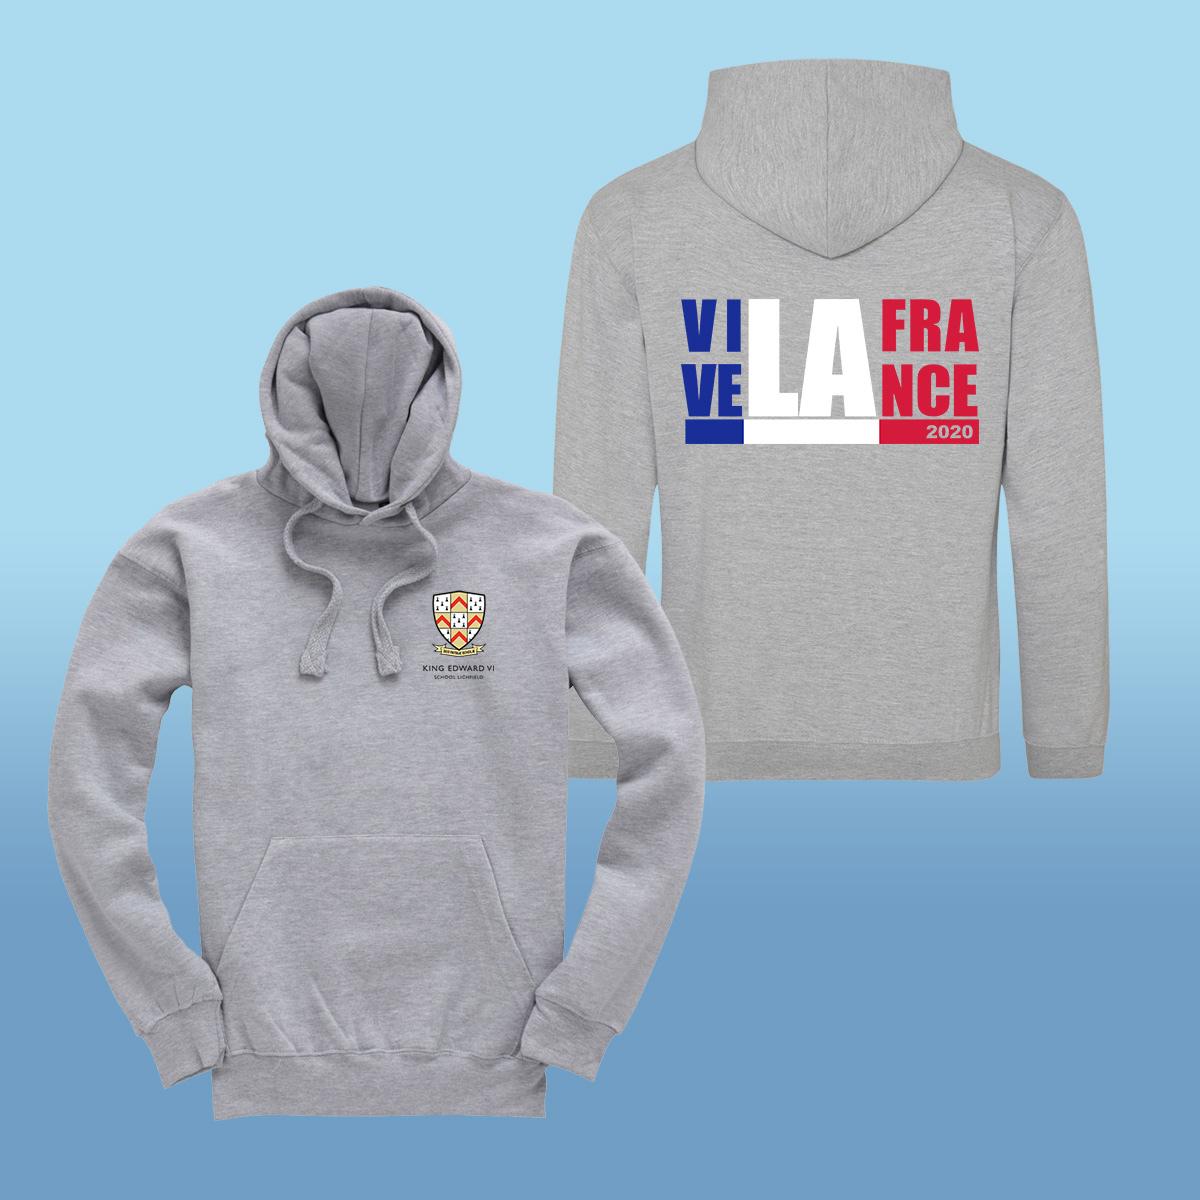 King Edward Vi School France Trip 2020 Hoodies